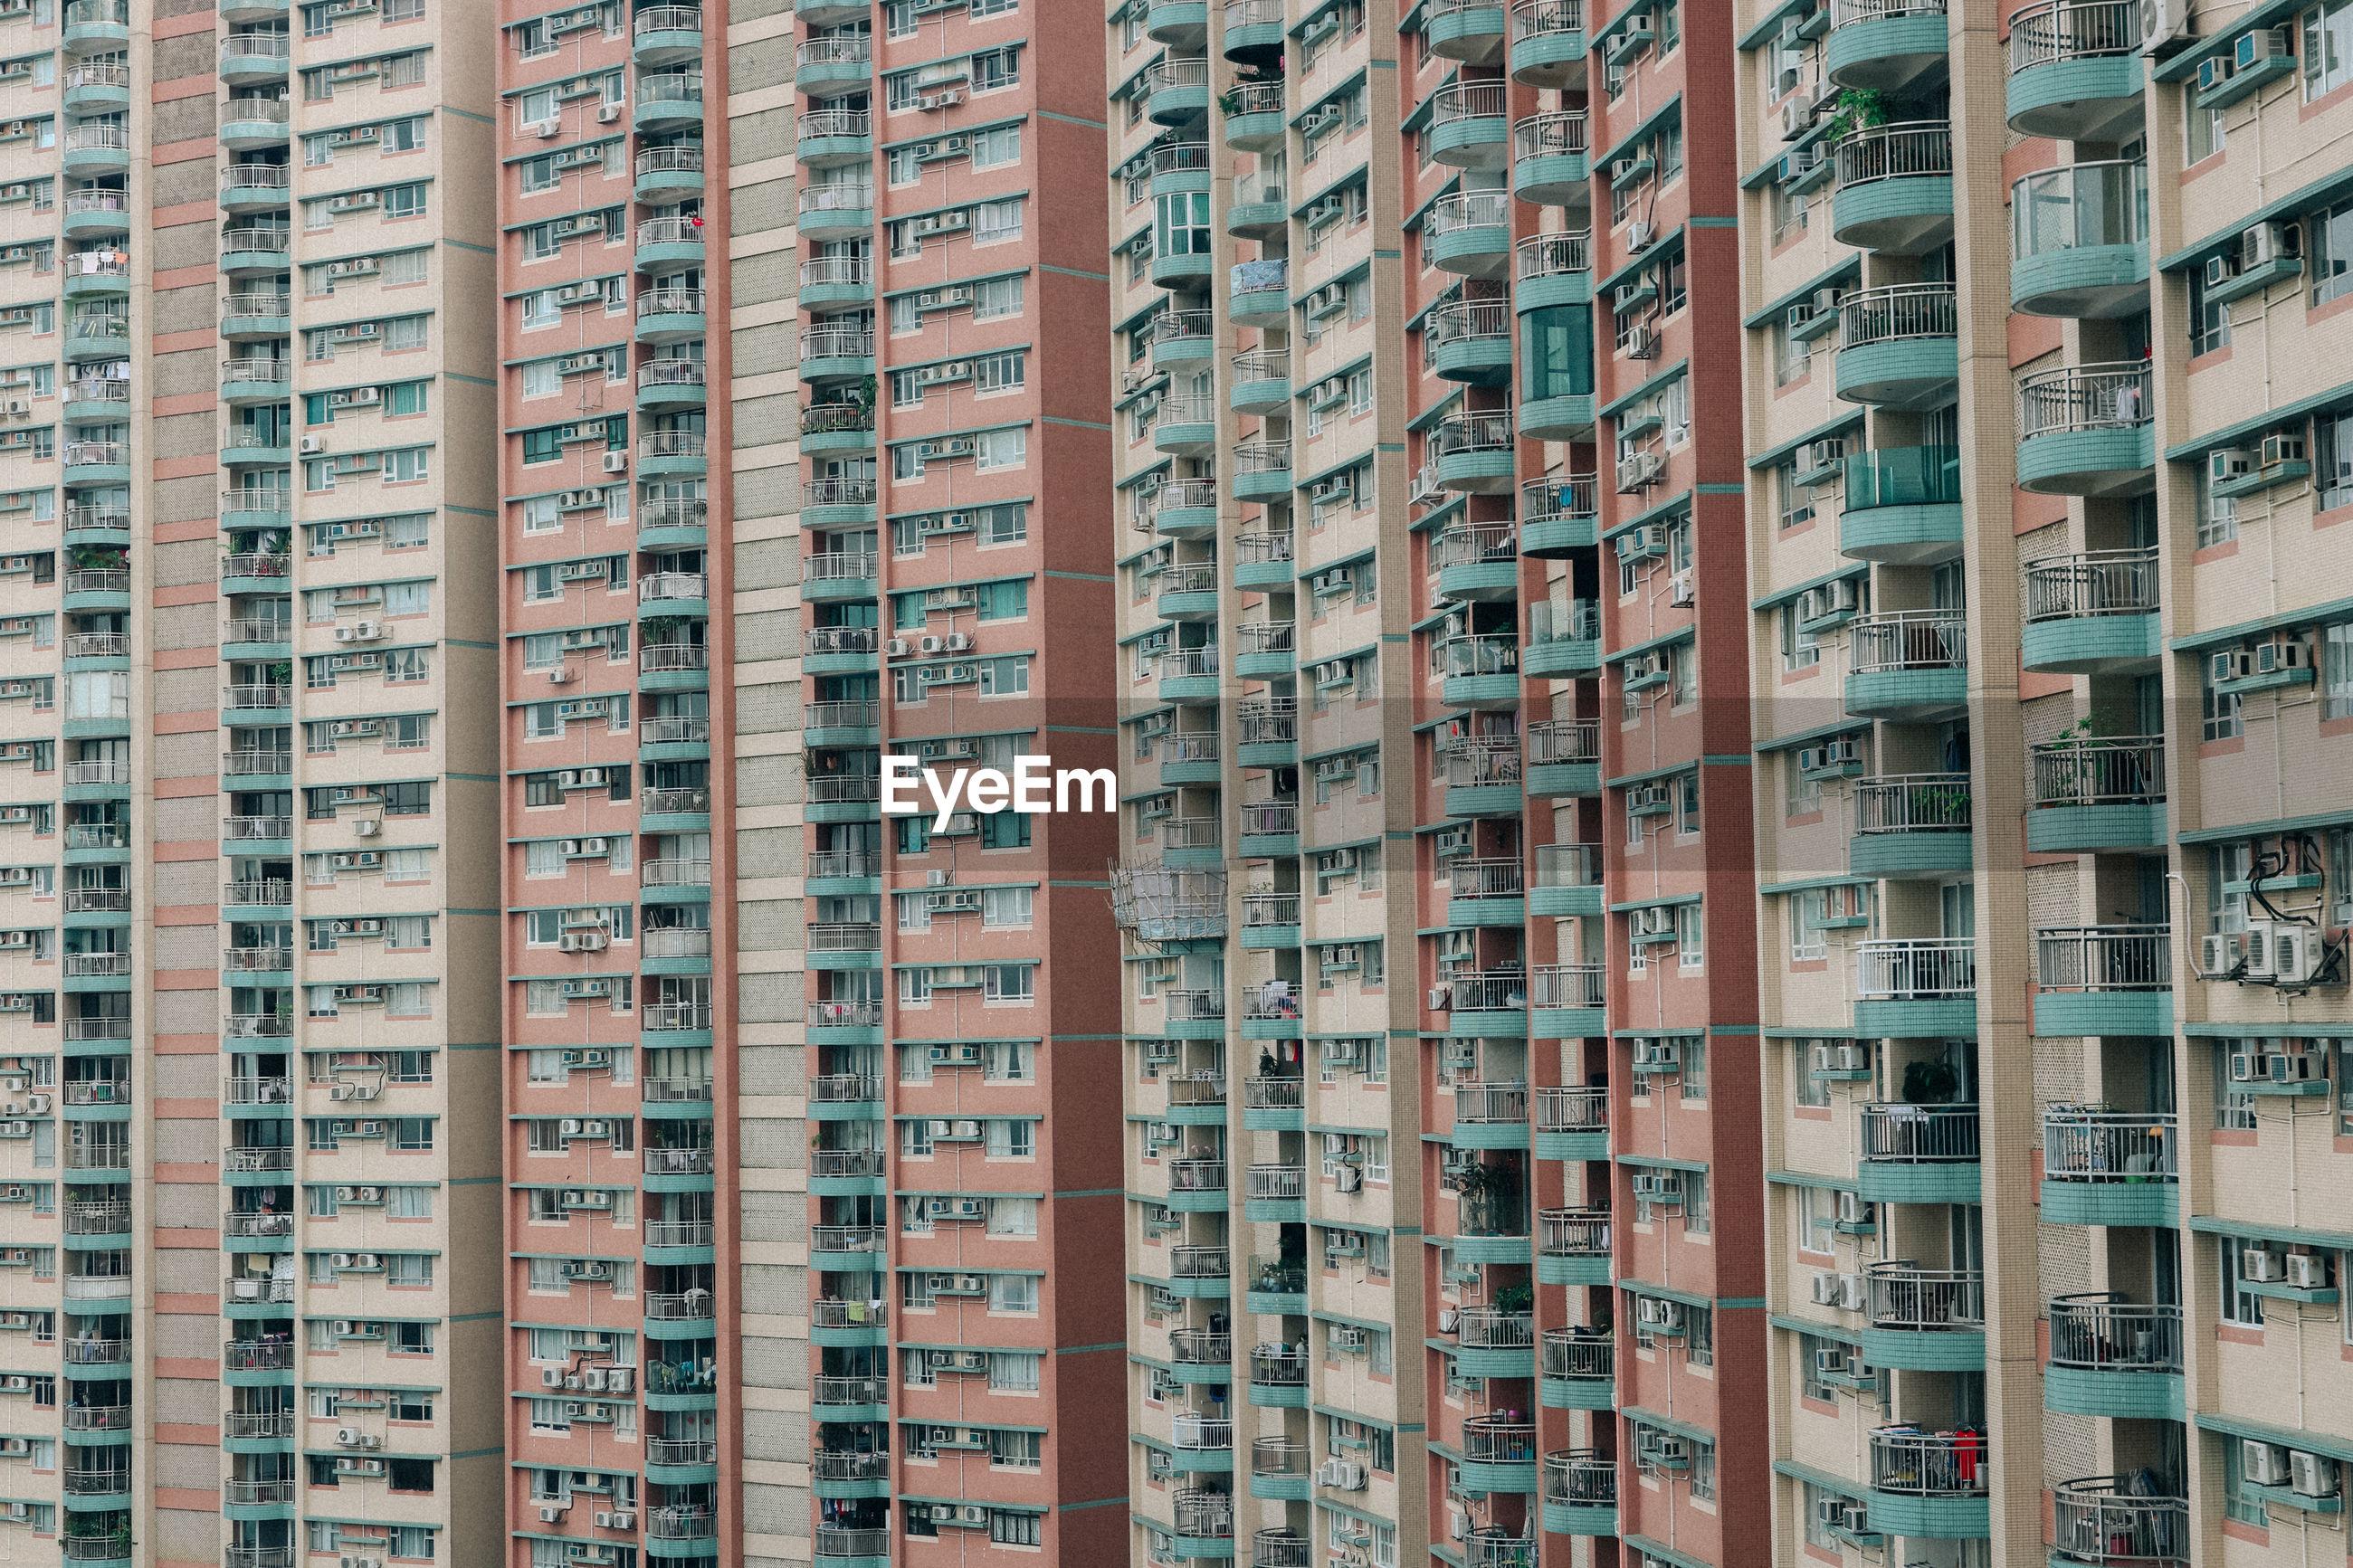 Low angle view of buildings in hongkong